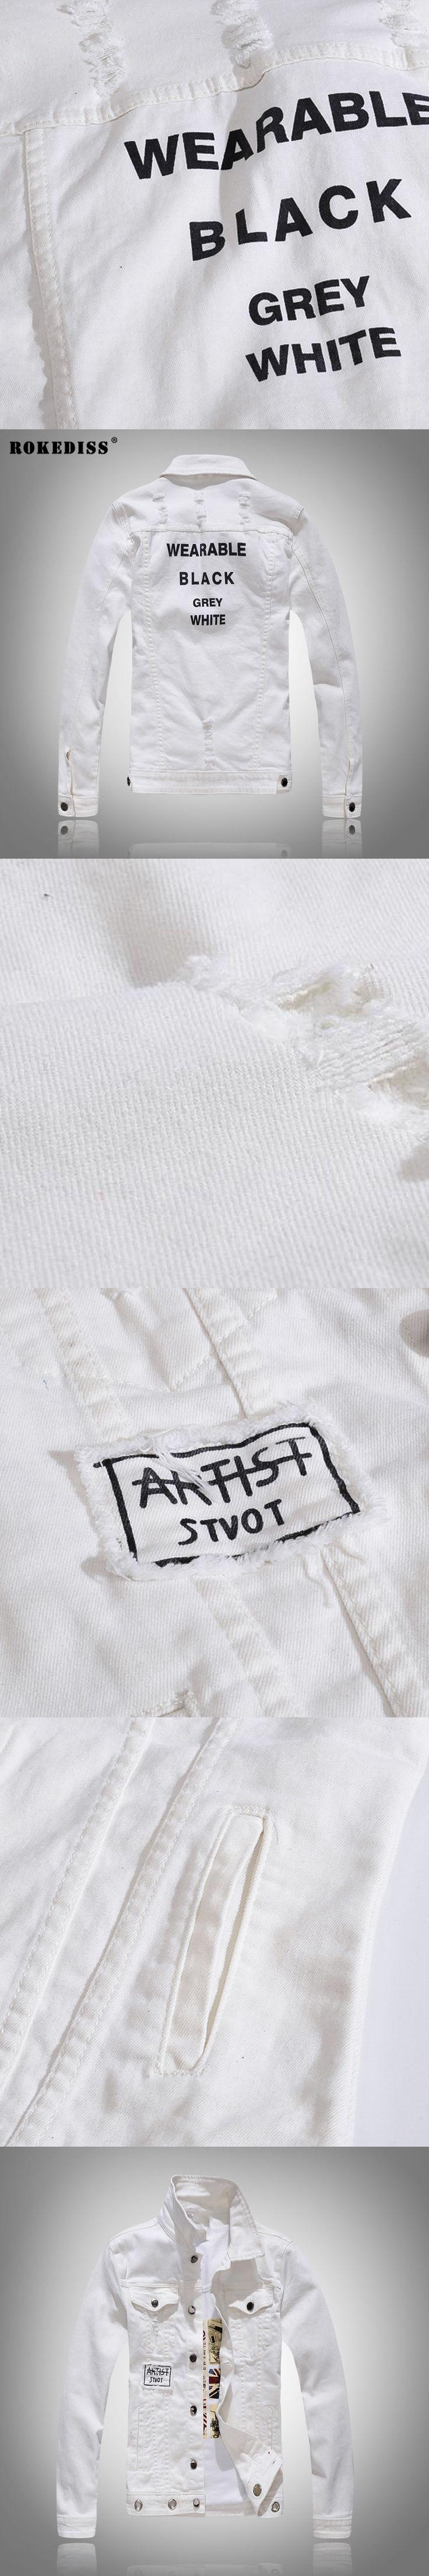 ROKEDISS Top Quality streetwear printing Denim Jackets Men Hip Hop Clothing Jeans Jackets fashion Men's denim jacket W060